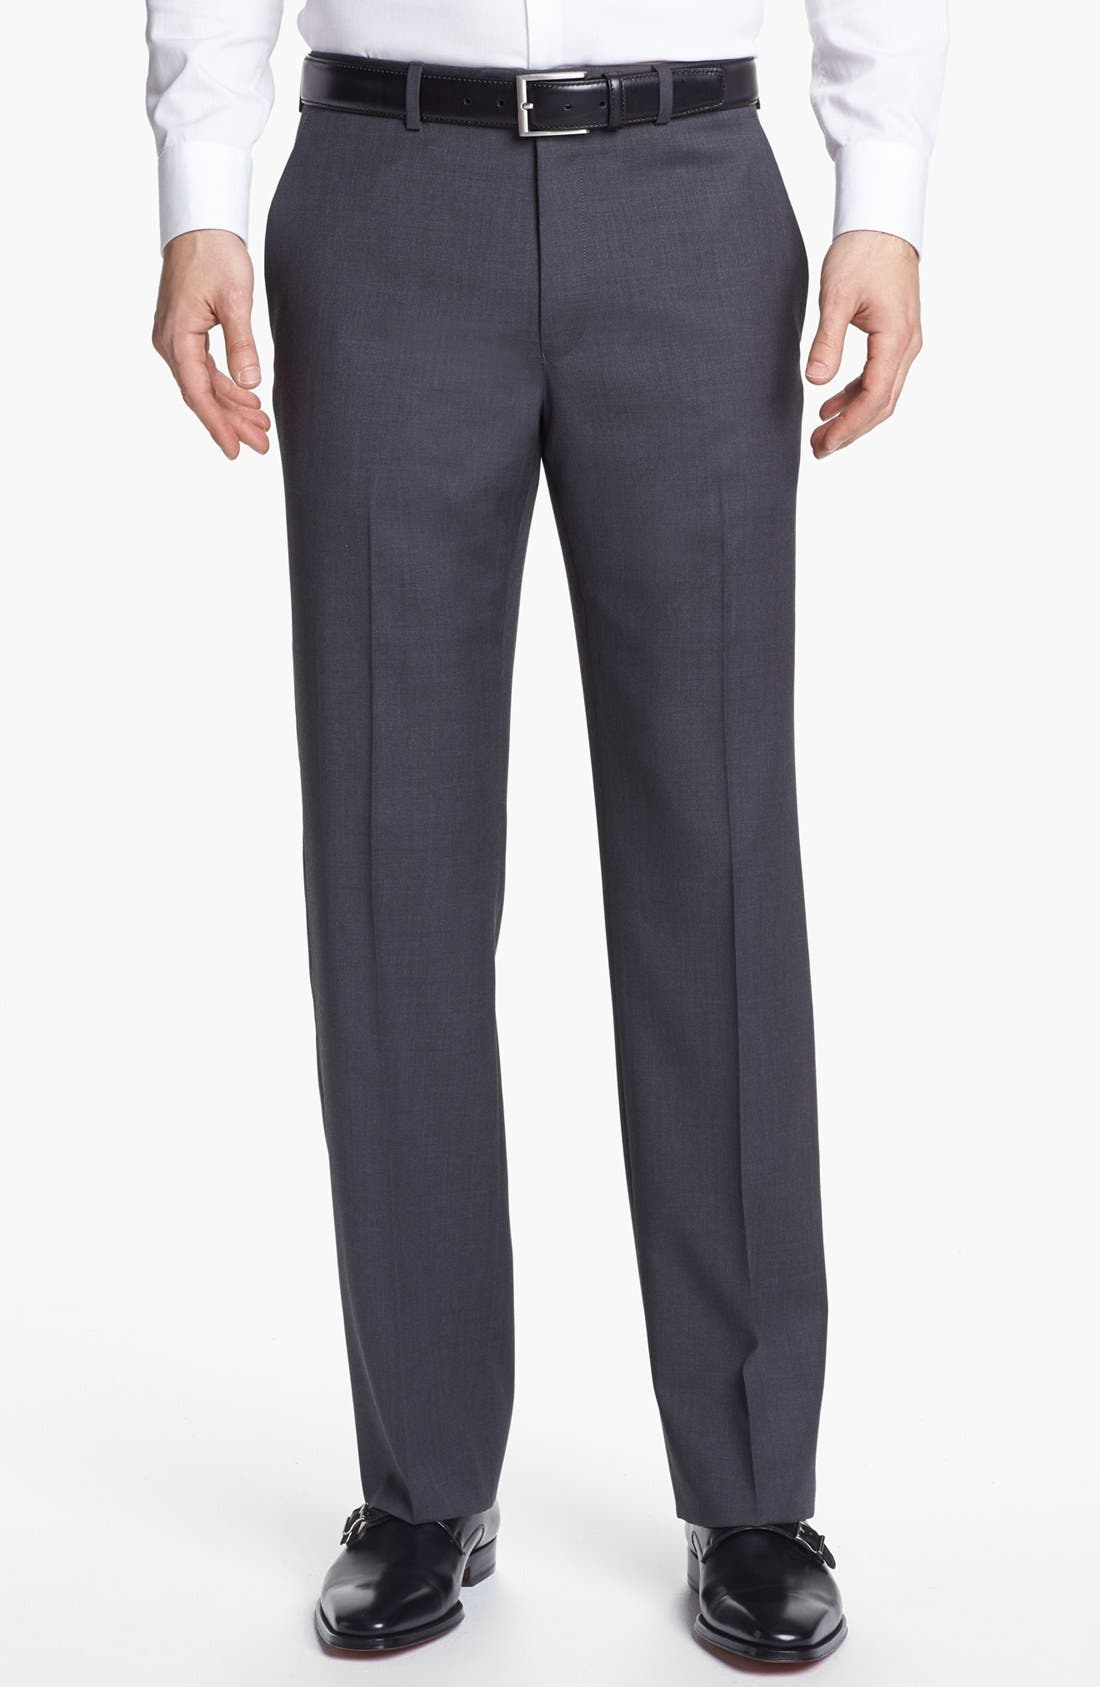 Alternate Image 1 Selected - John Varvatos 'Thompson' Trousers